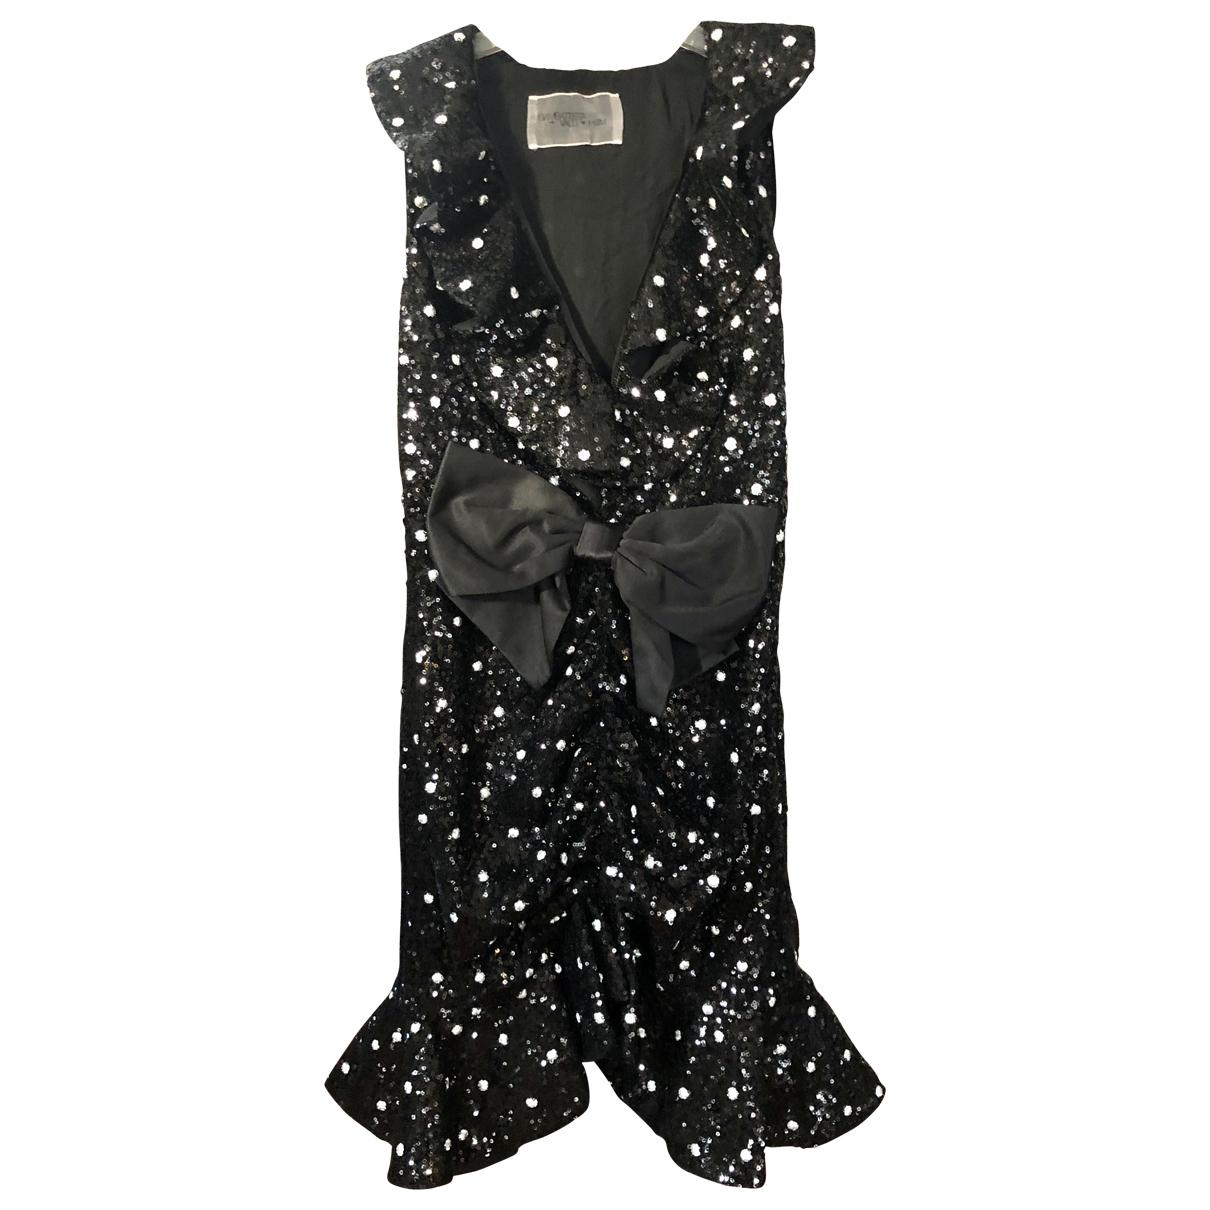 Giambattista Valli X H&m \N Black Glitter dress for Women M International